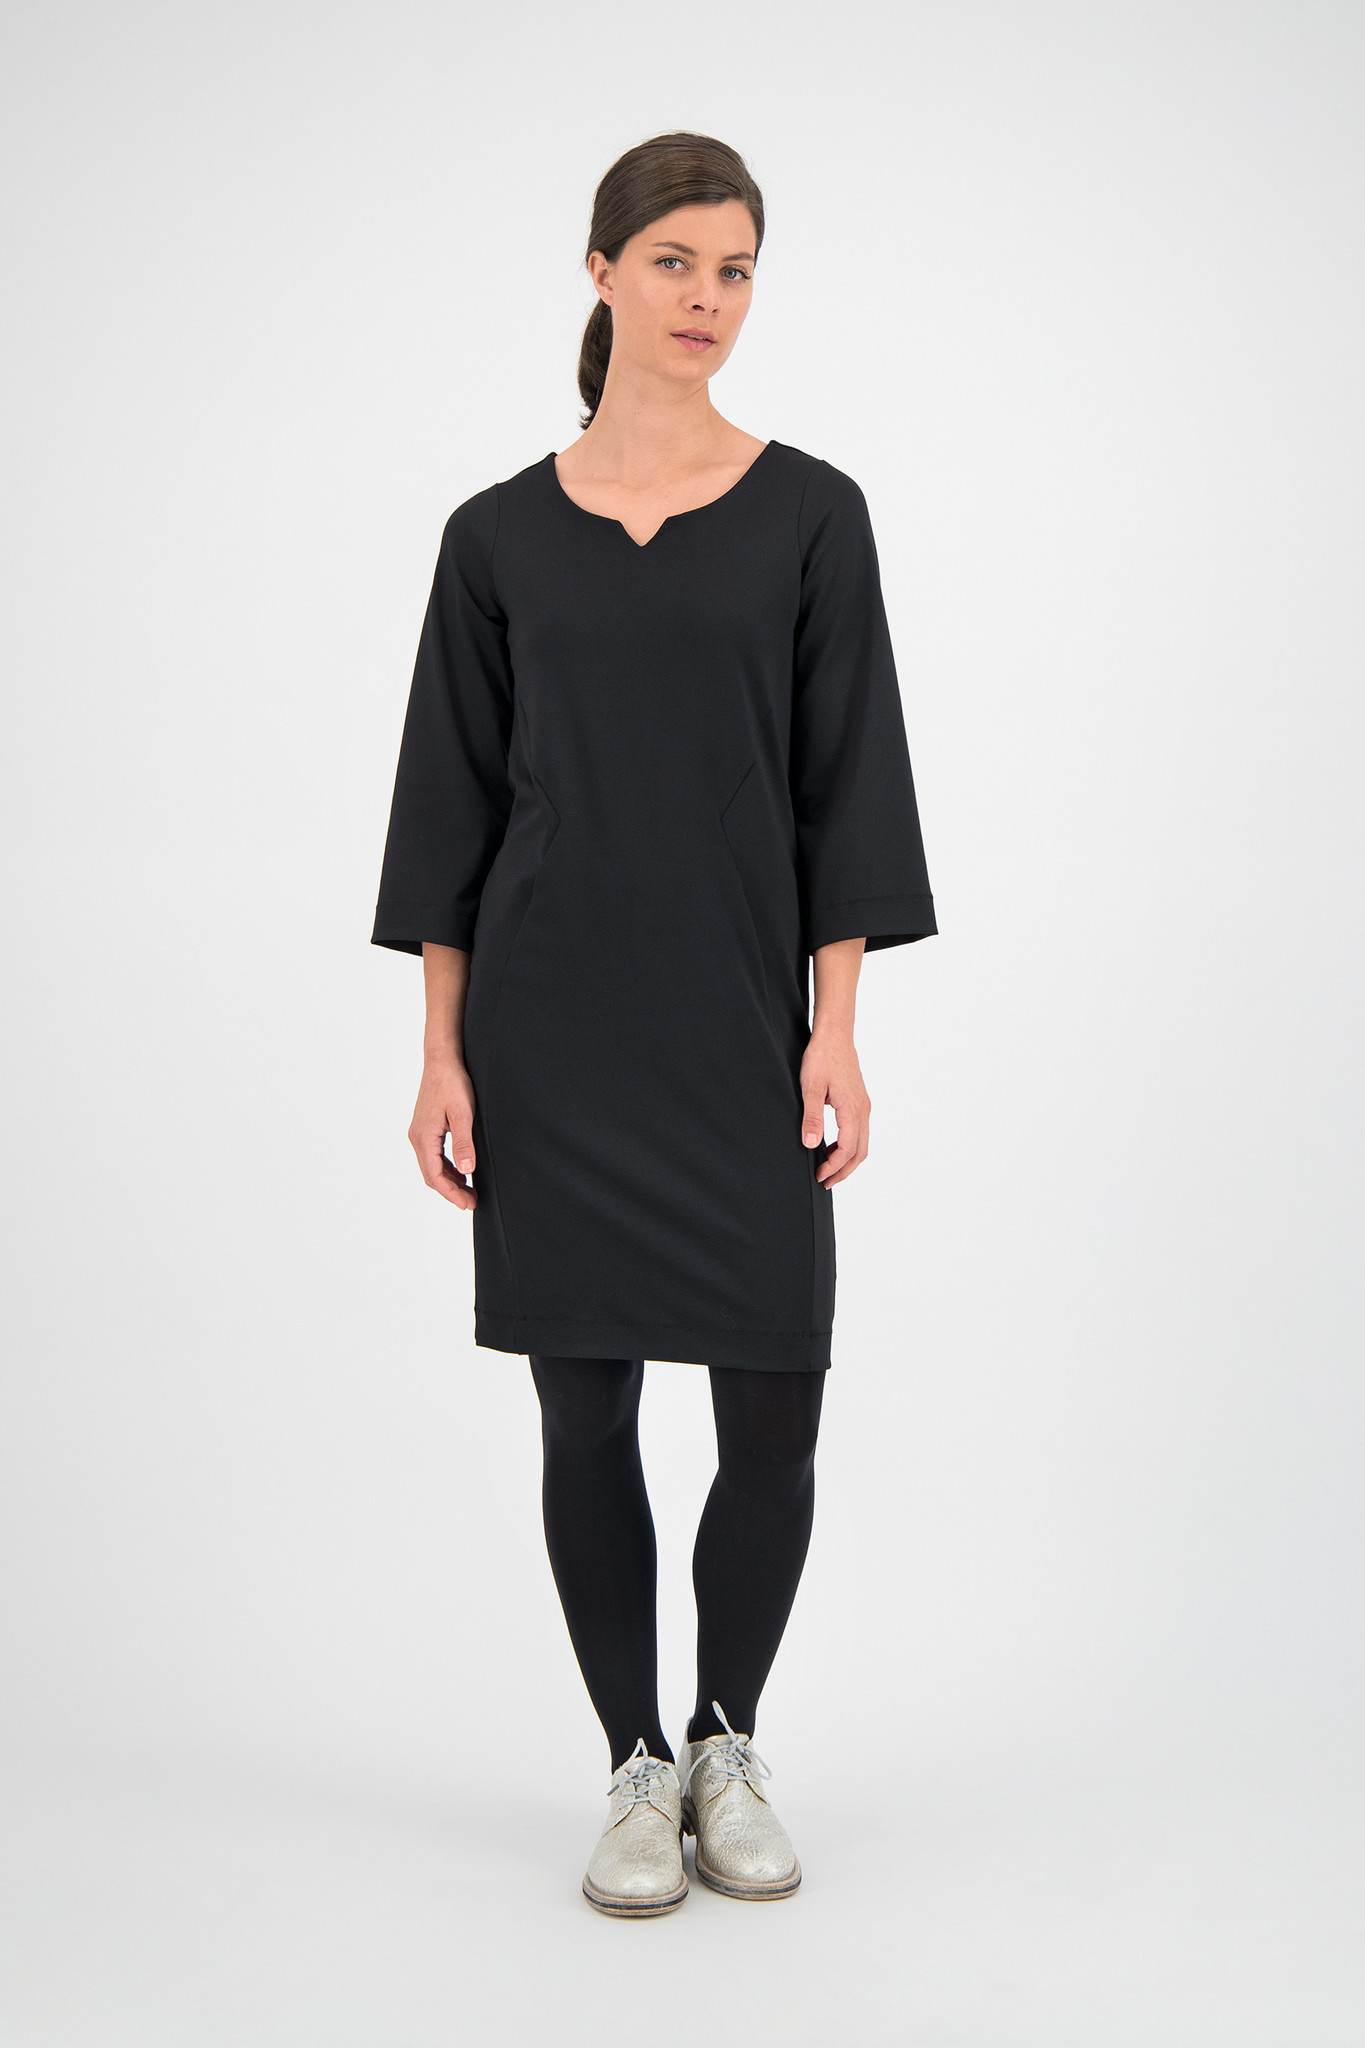 SYLVER Techno Jersey Dress - Black